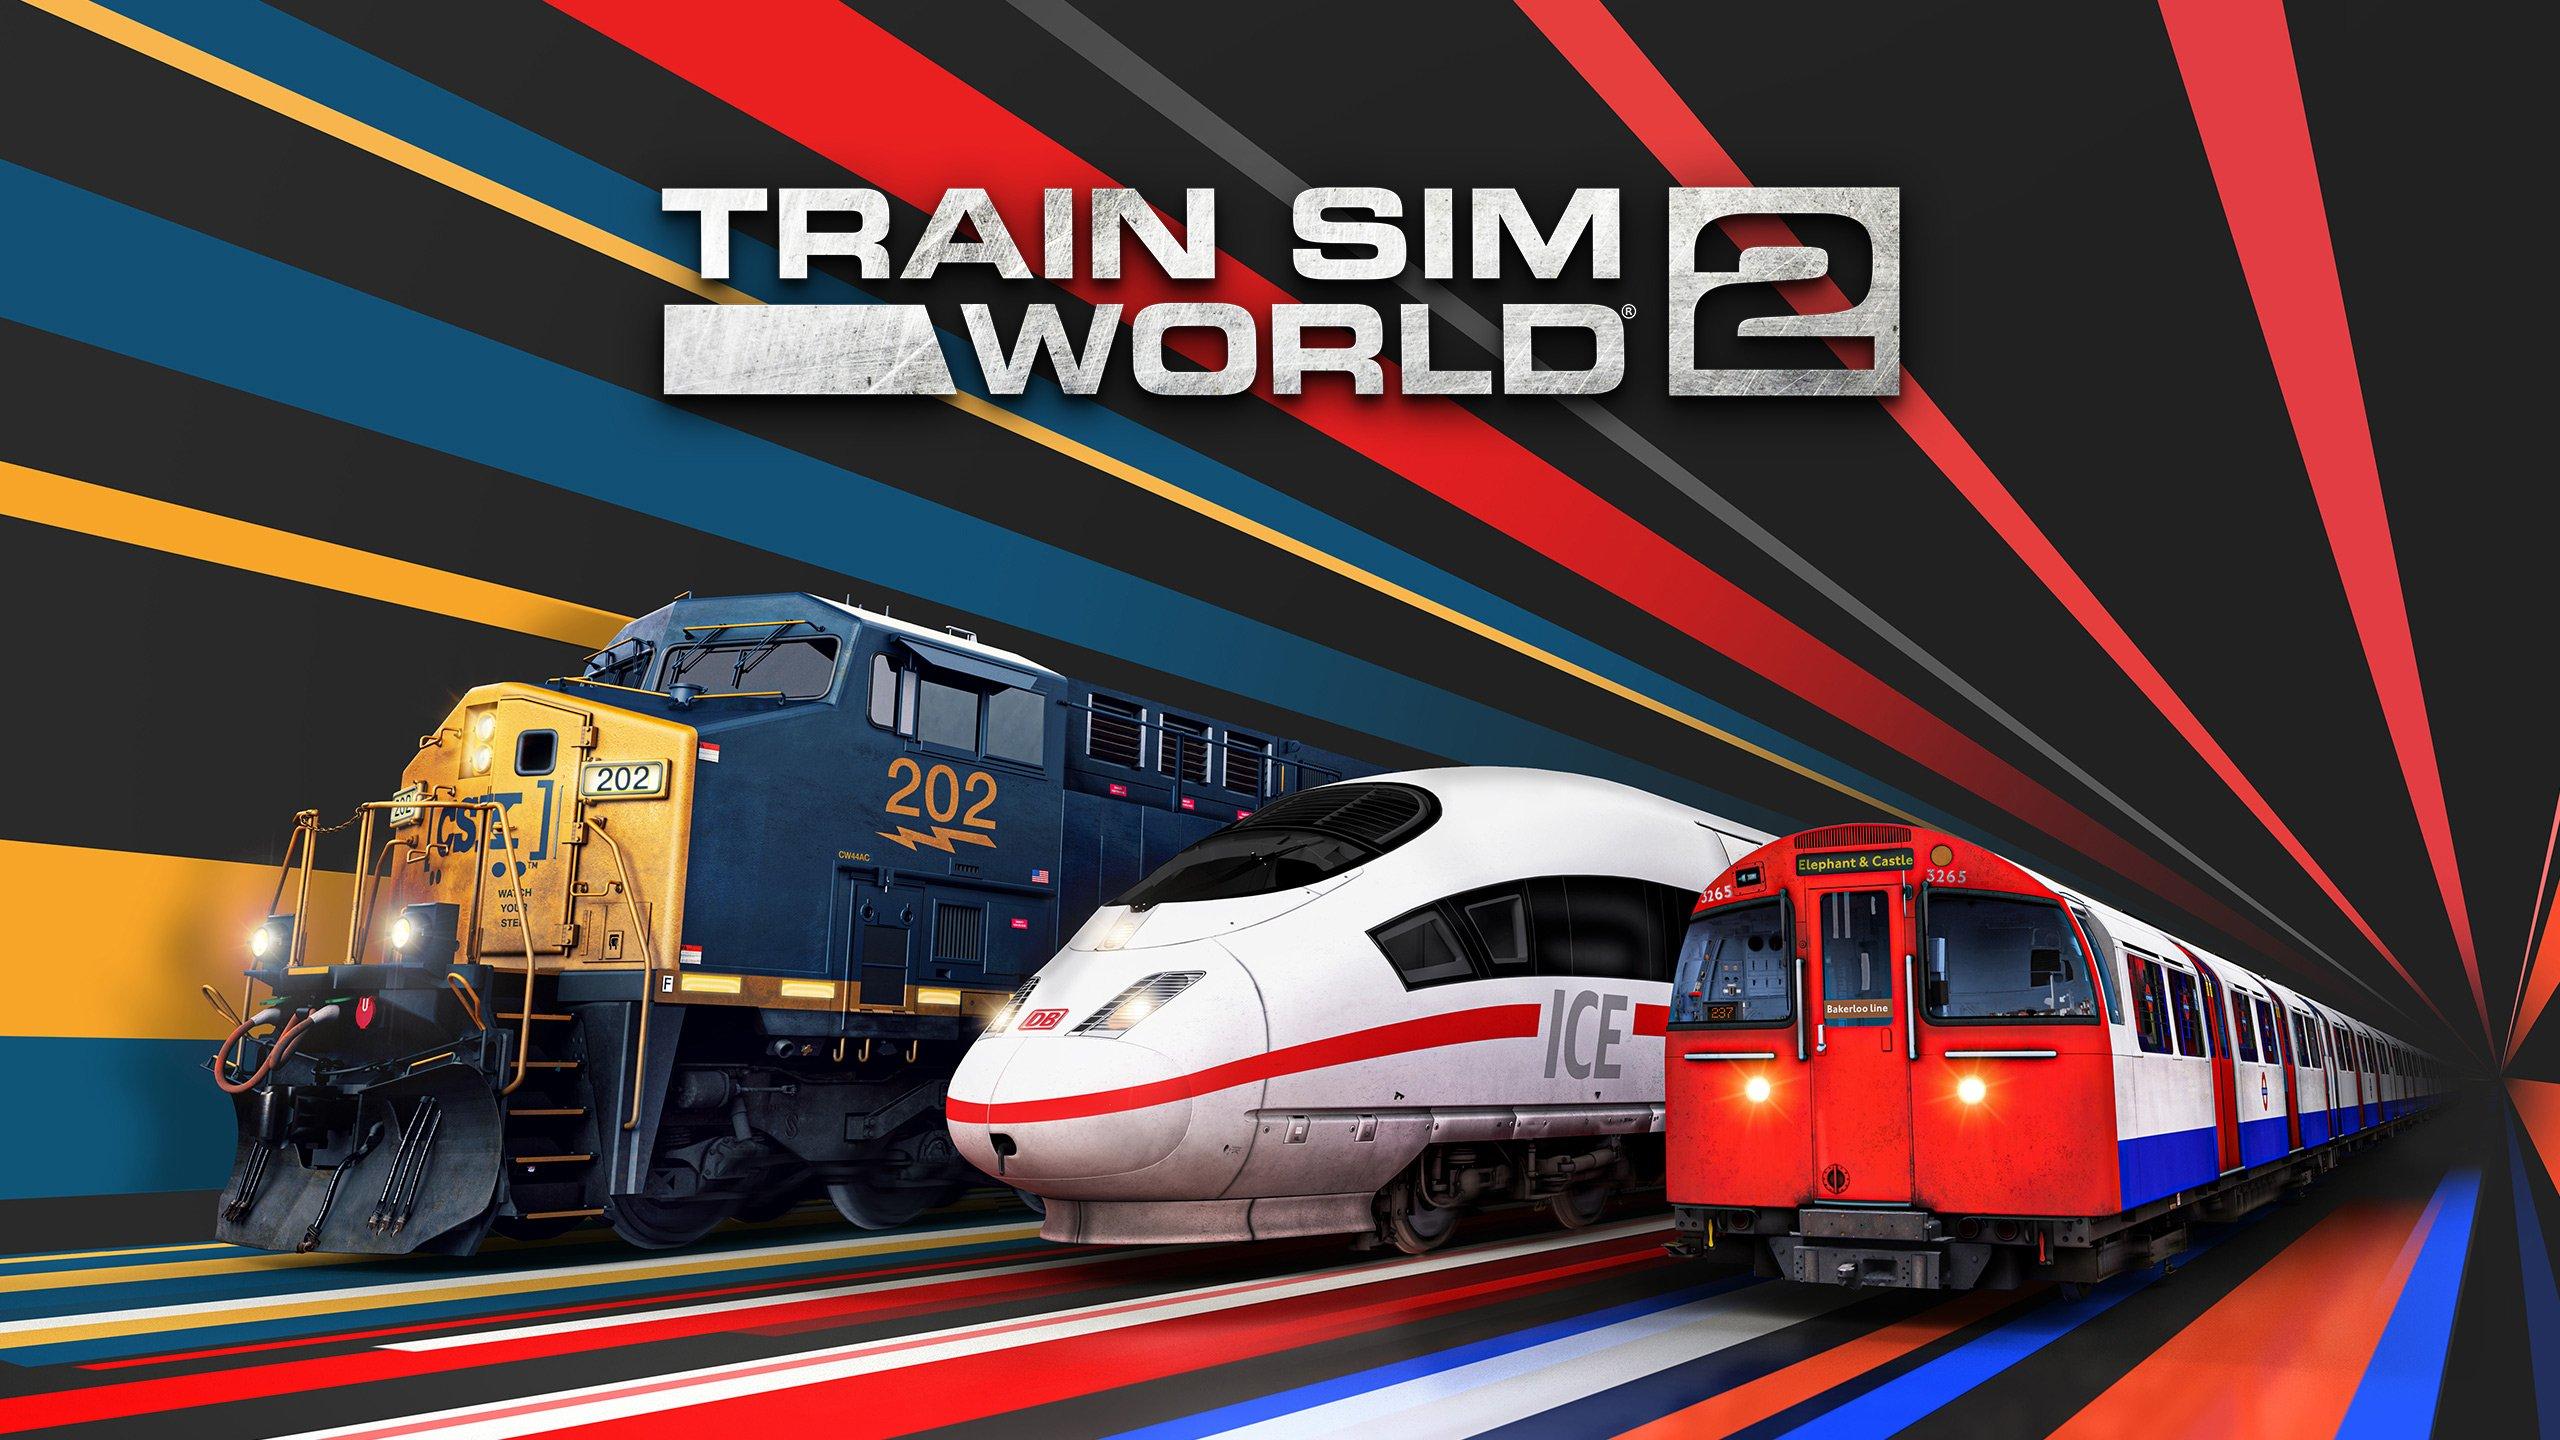 Train Sim World® 2 Epic Games Store Üzerinde Ücretsiz